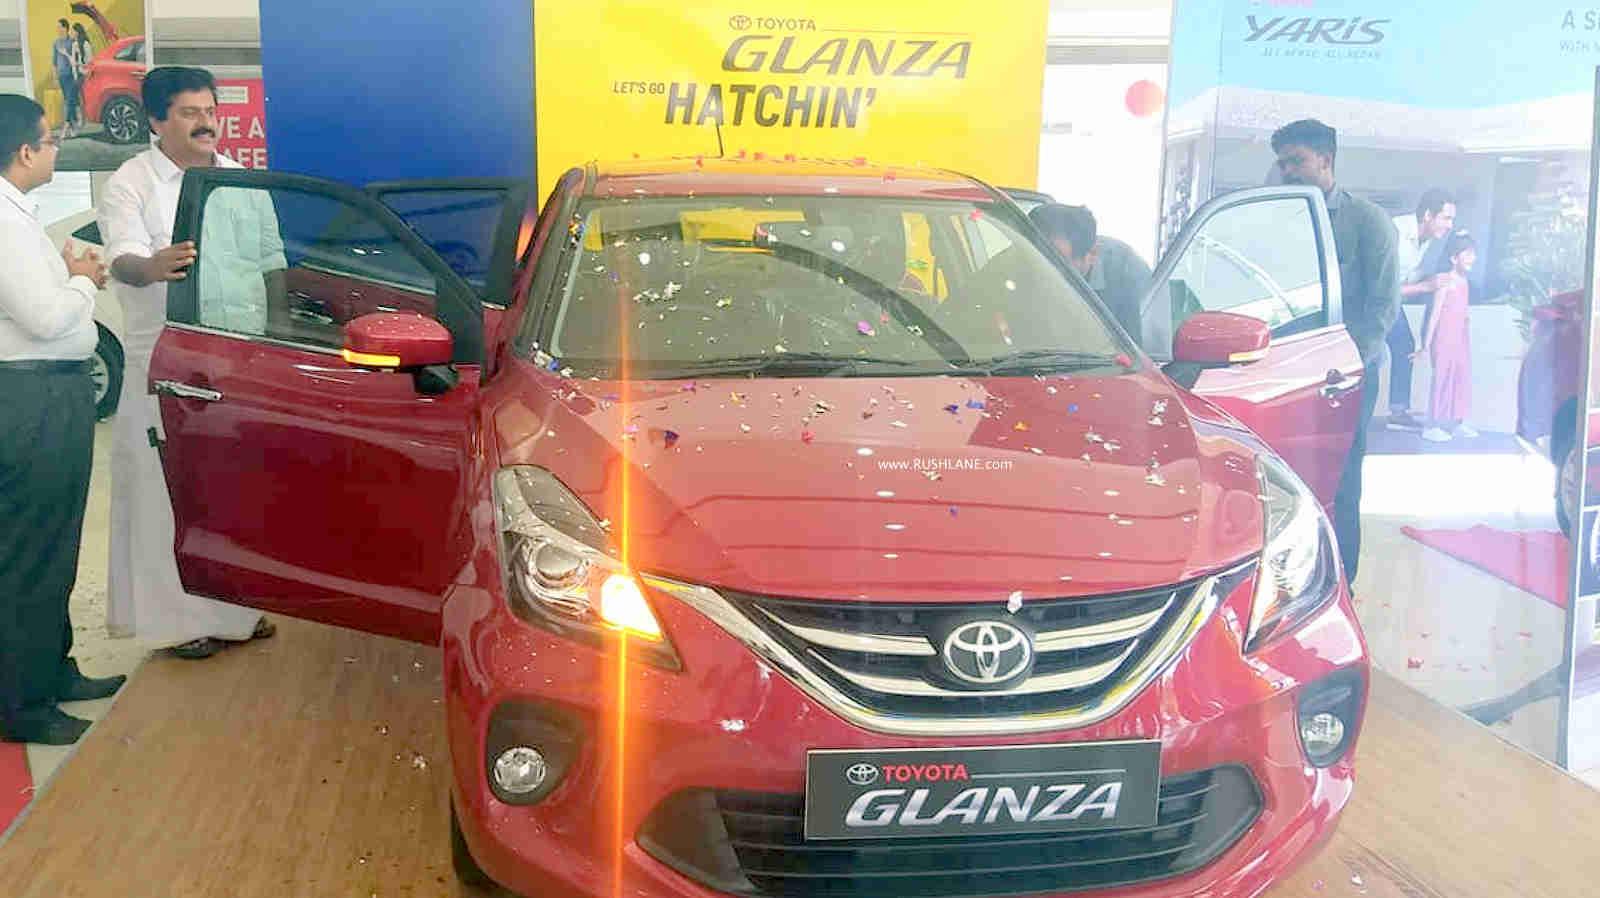 Toyota Glanza sales